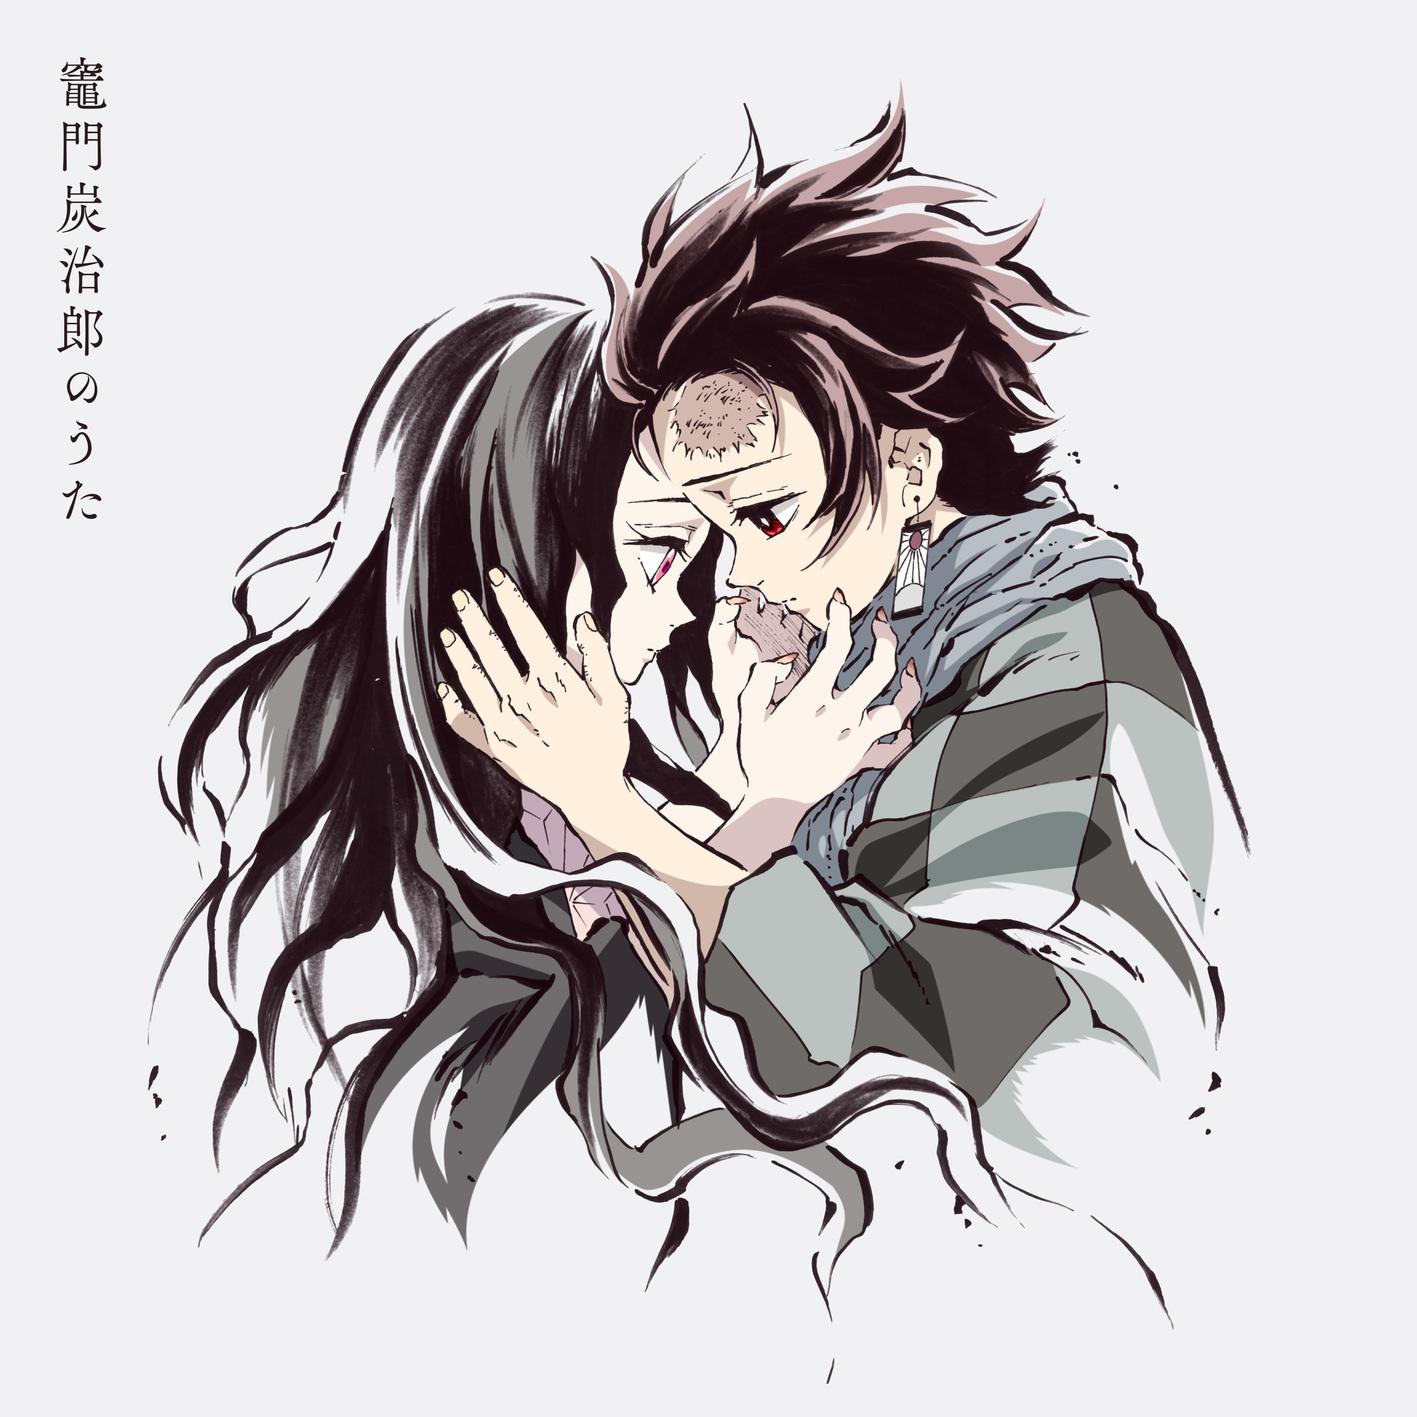 TVアニメ「鬼滅の刃」|OP・ED、第19話挿入歌など好評配信中!